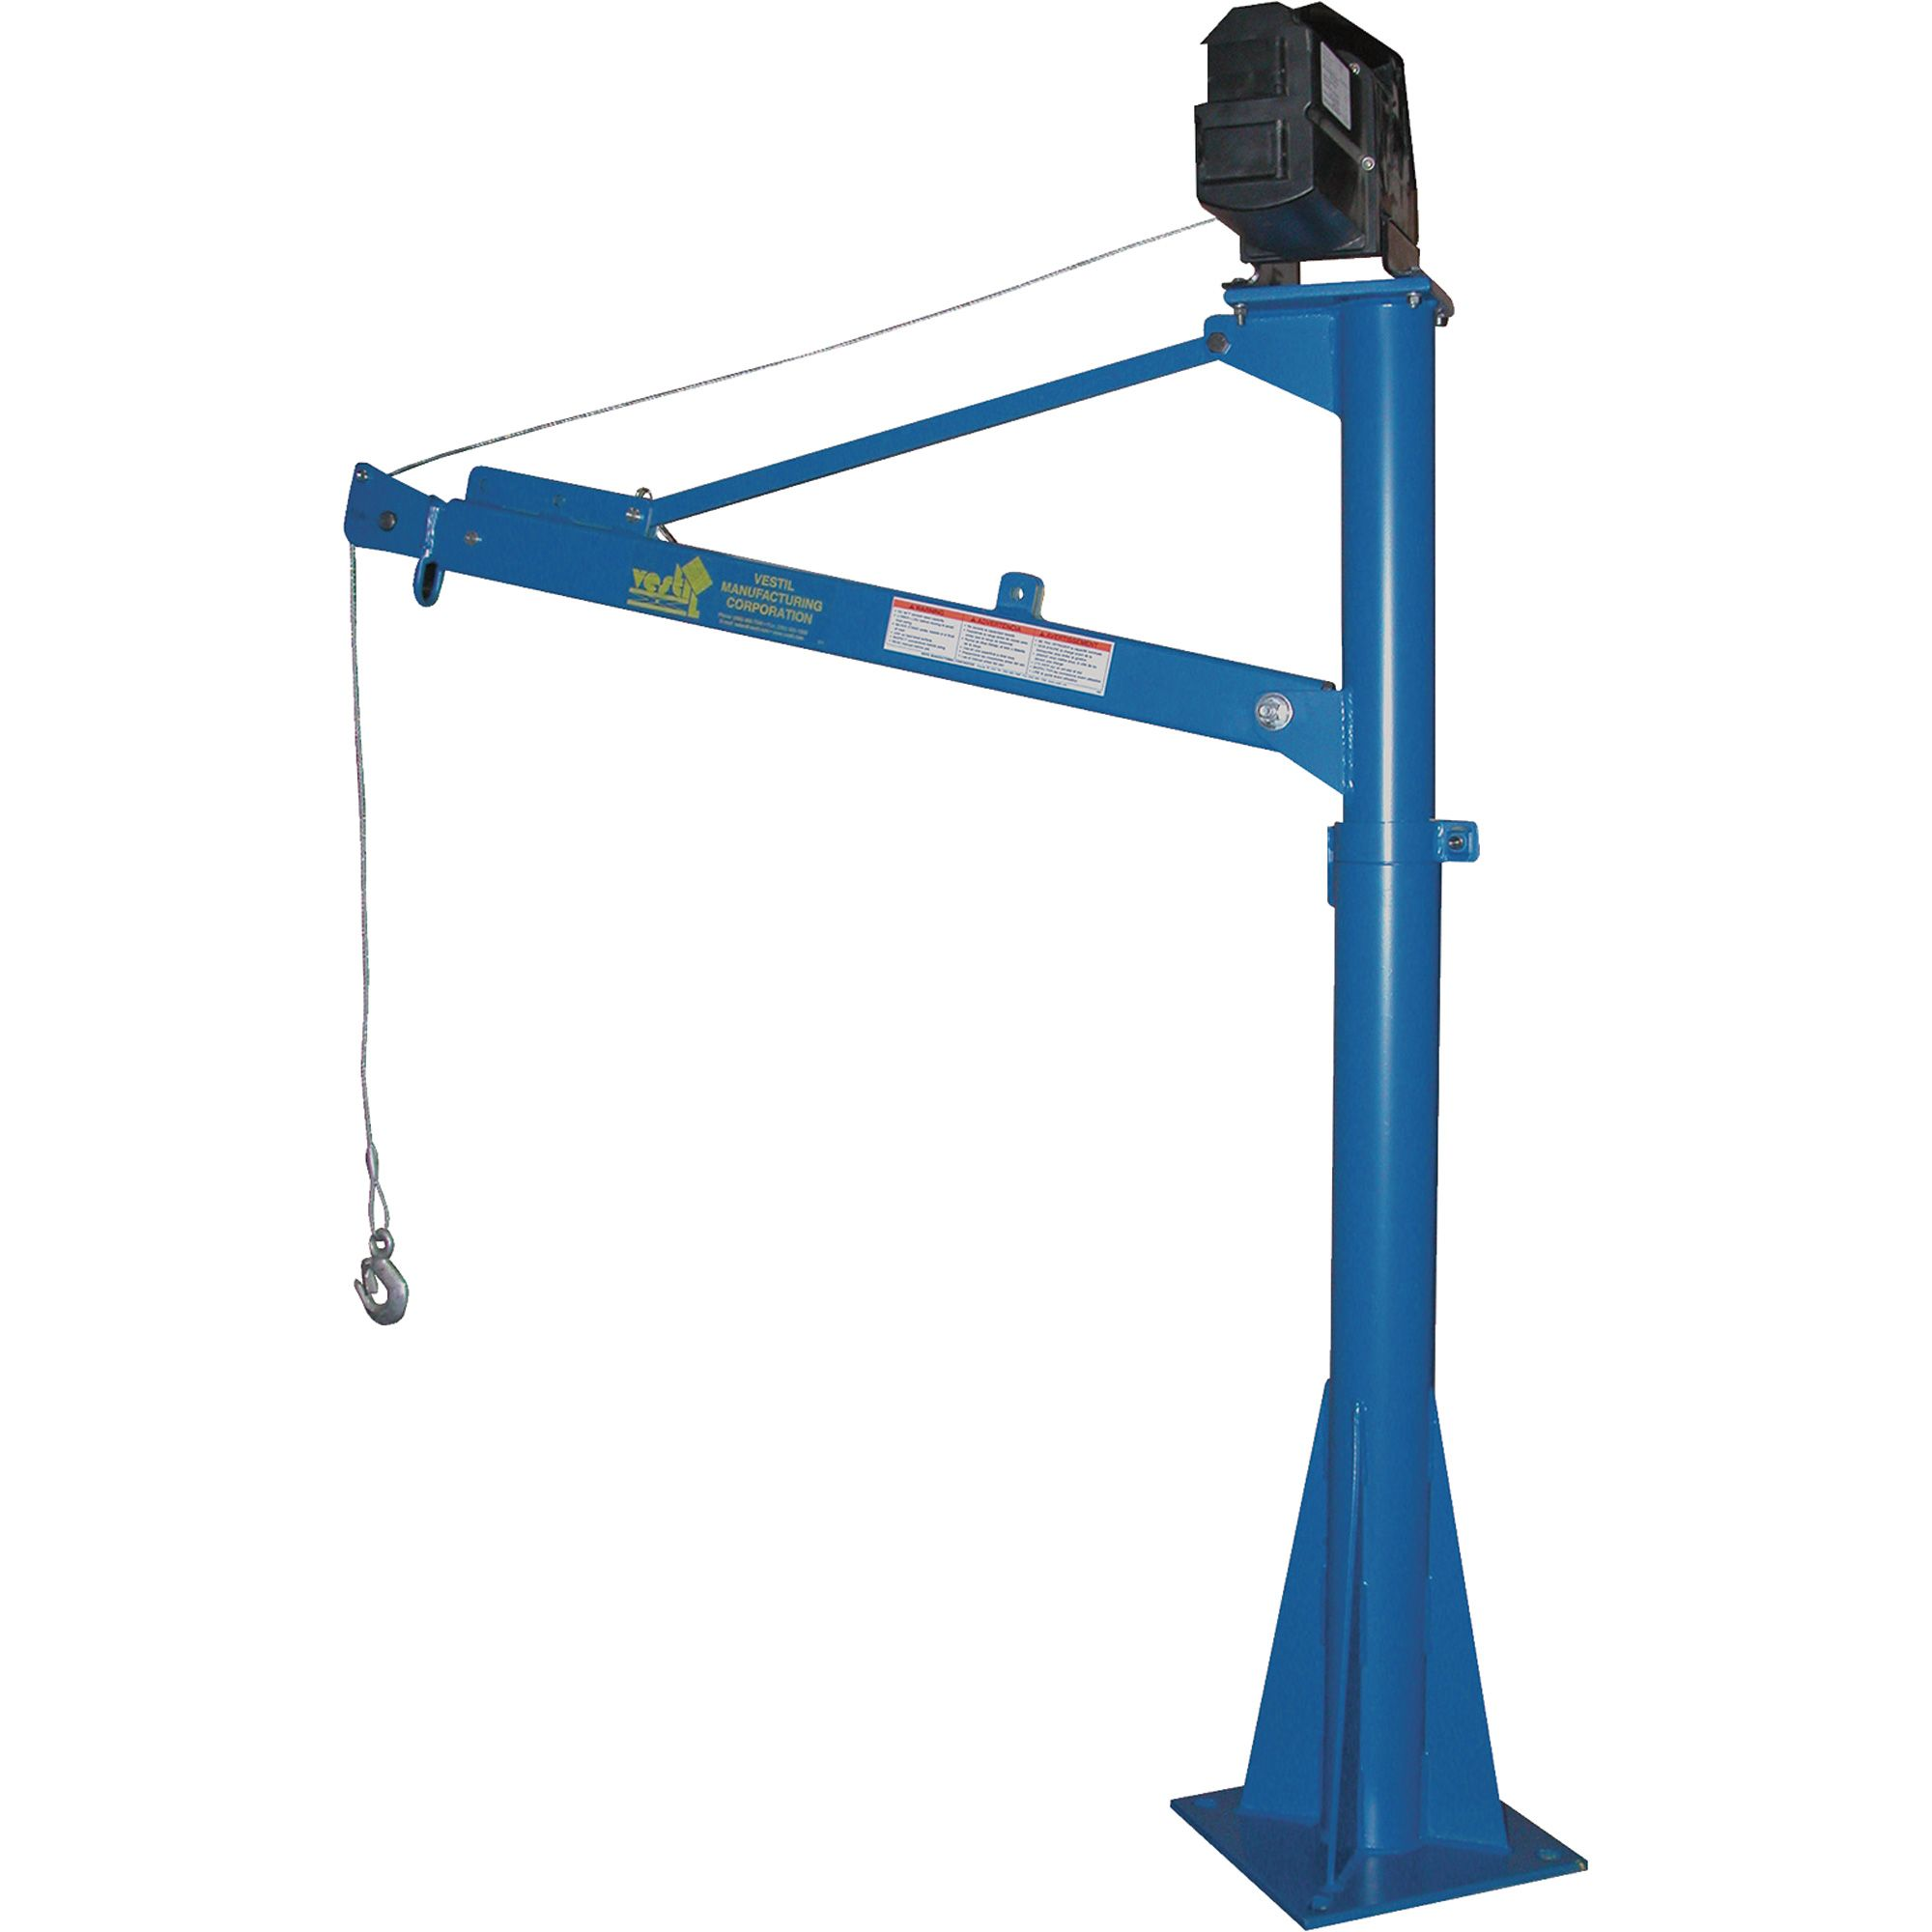 Vestil power lift jib crane 1500 lb capacity 115v ac model